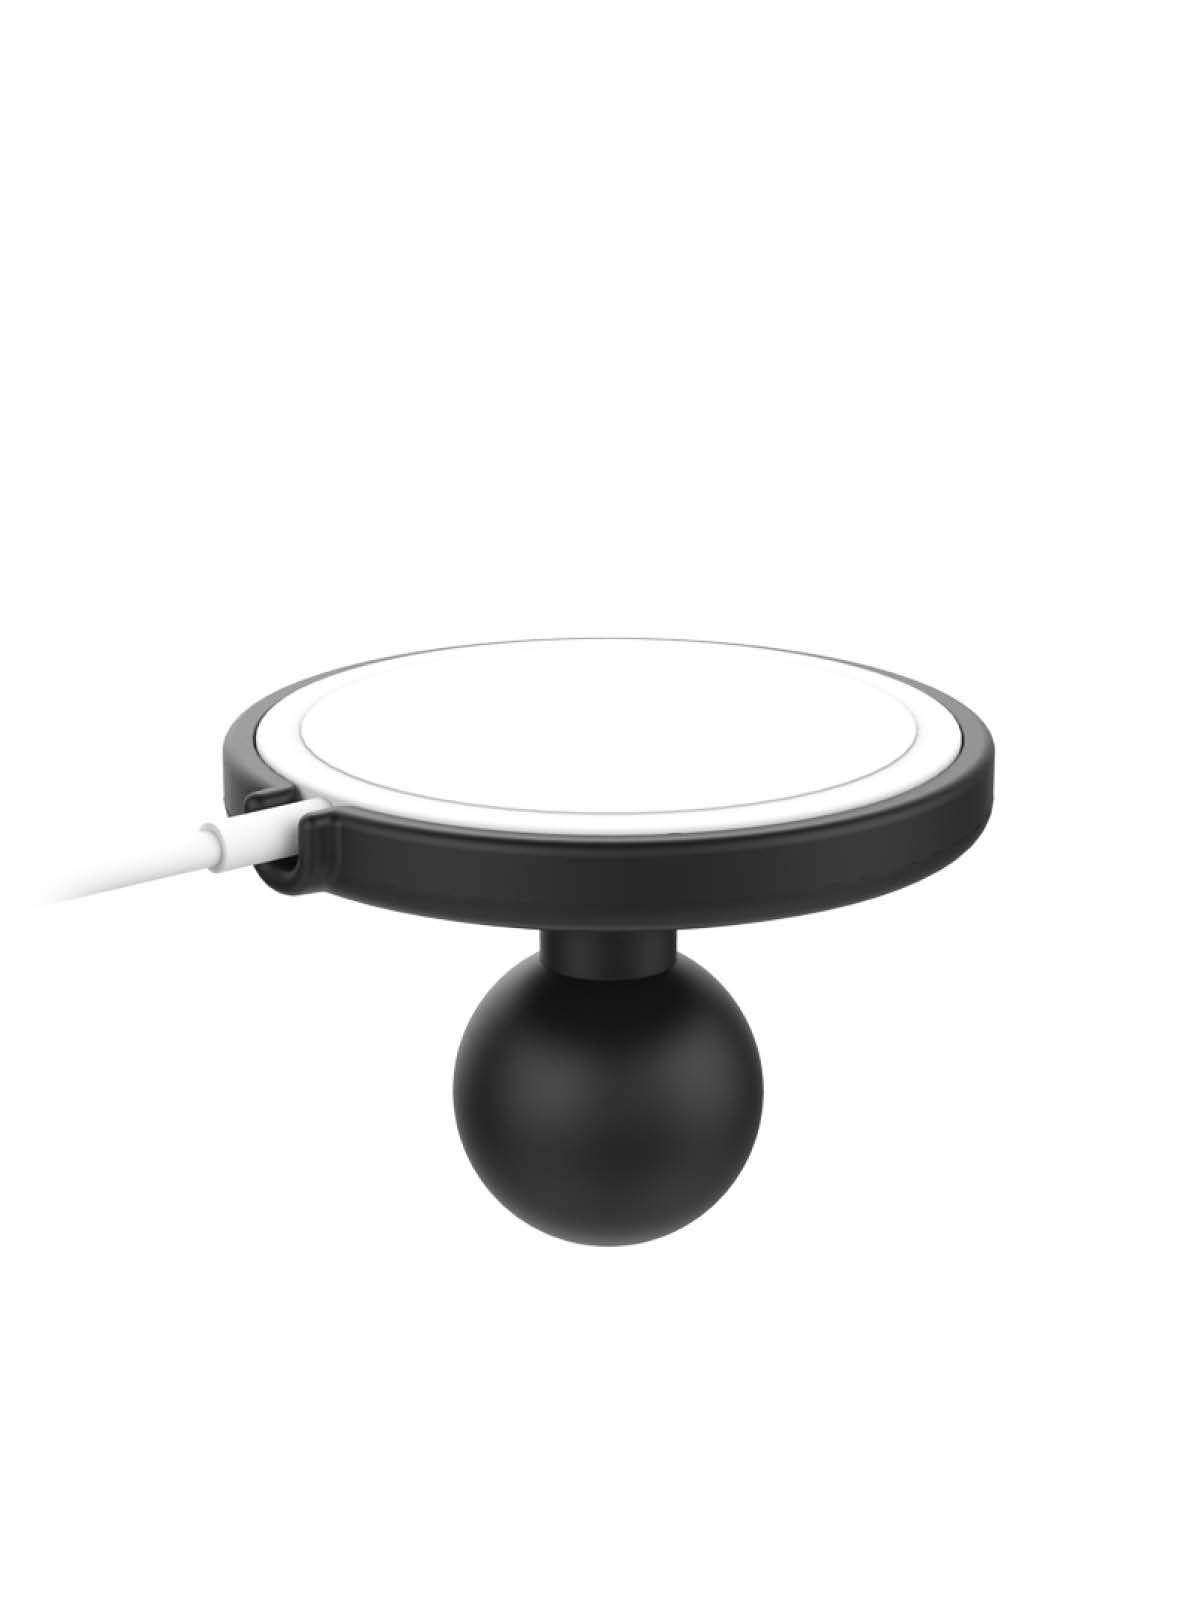 RAM Mounts Verbundstoff-Adapter für Apple MagSafe - B-Kugel (1 Zoll)